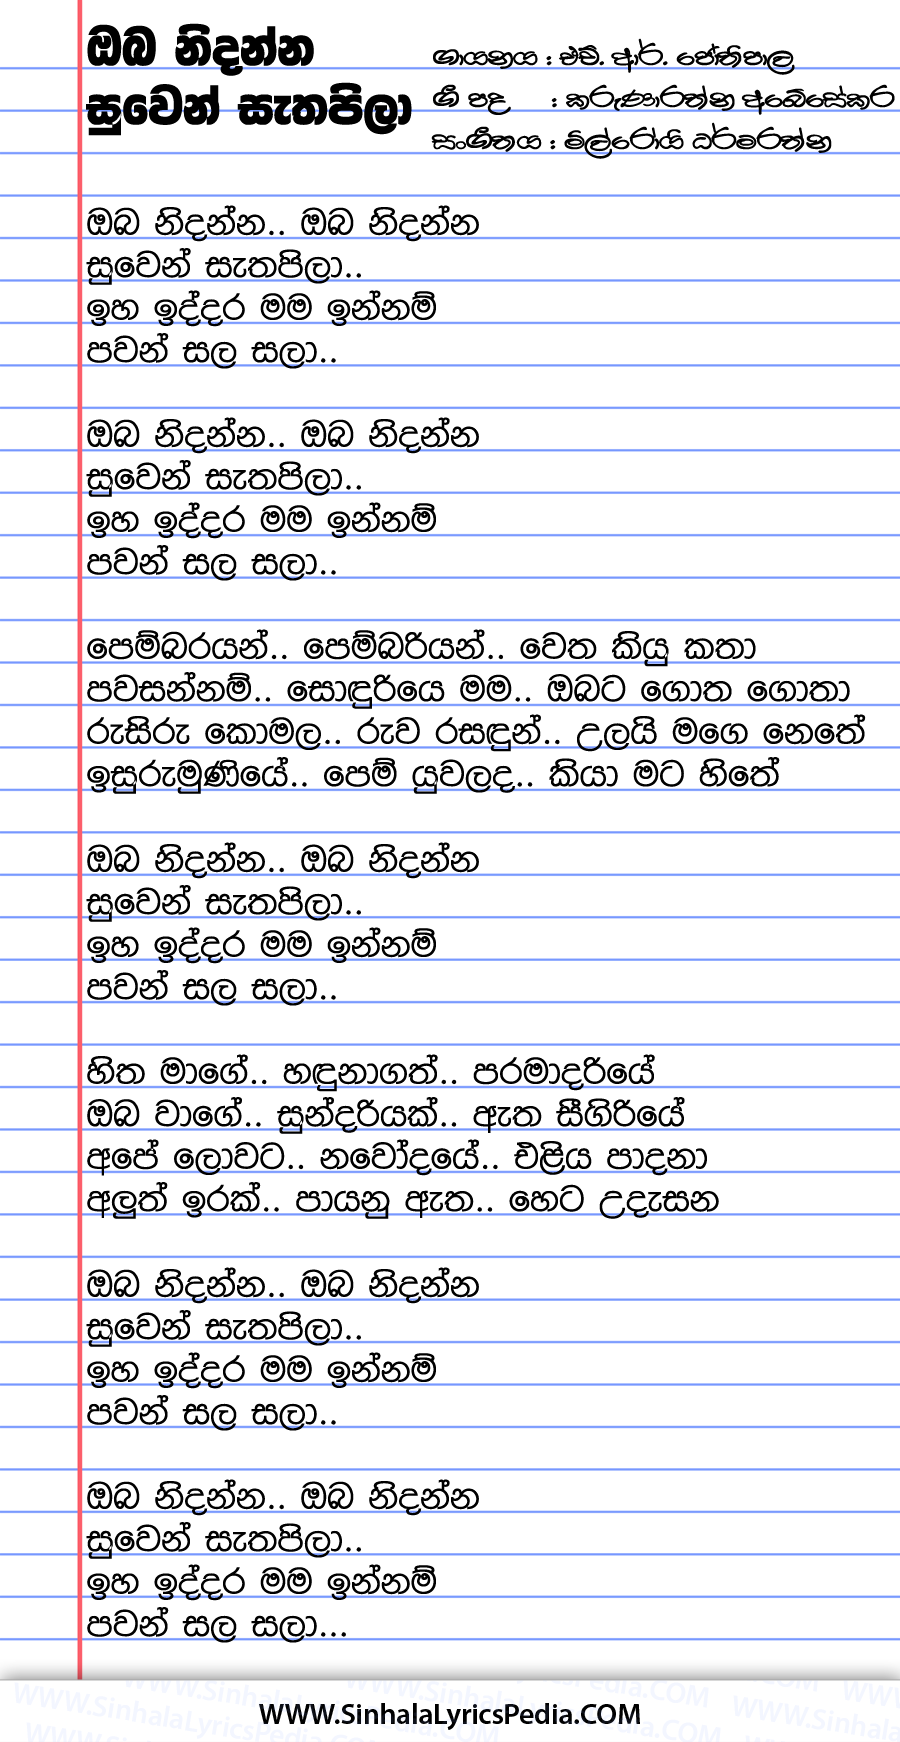 Oba Nidanna Oba Nidanna Suwen Sathapila Song Lyrics